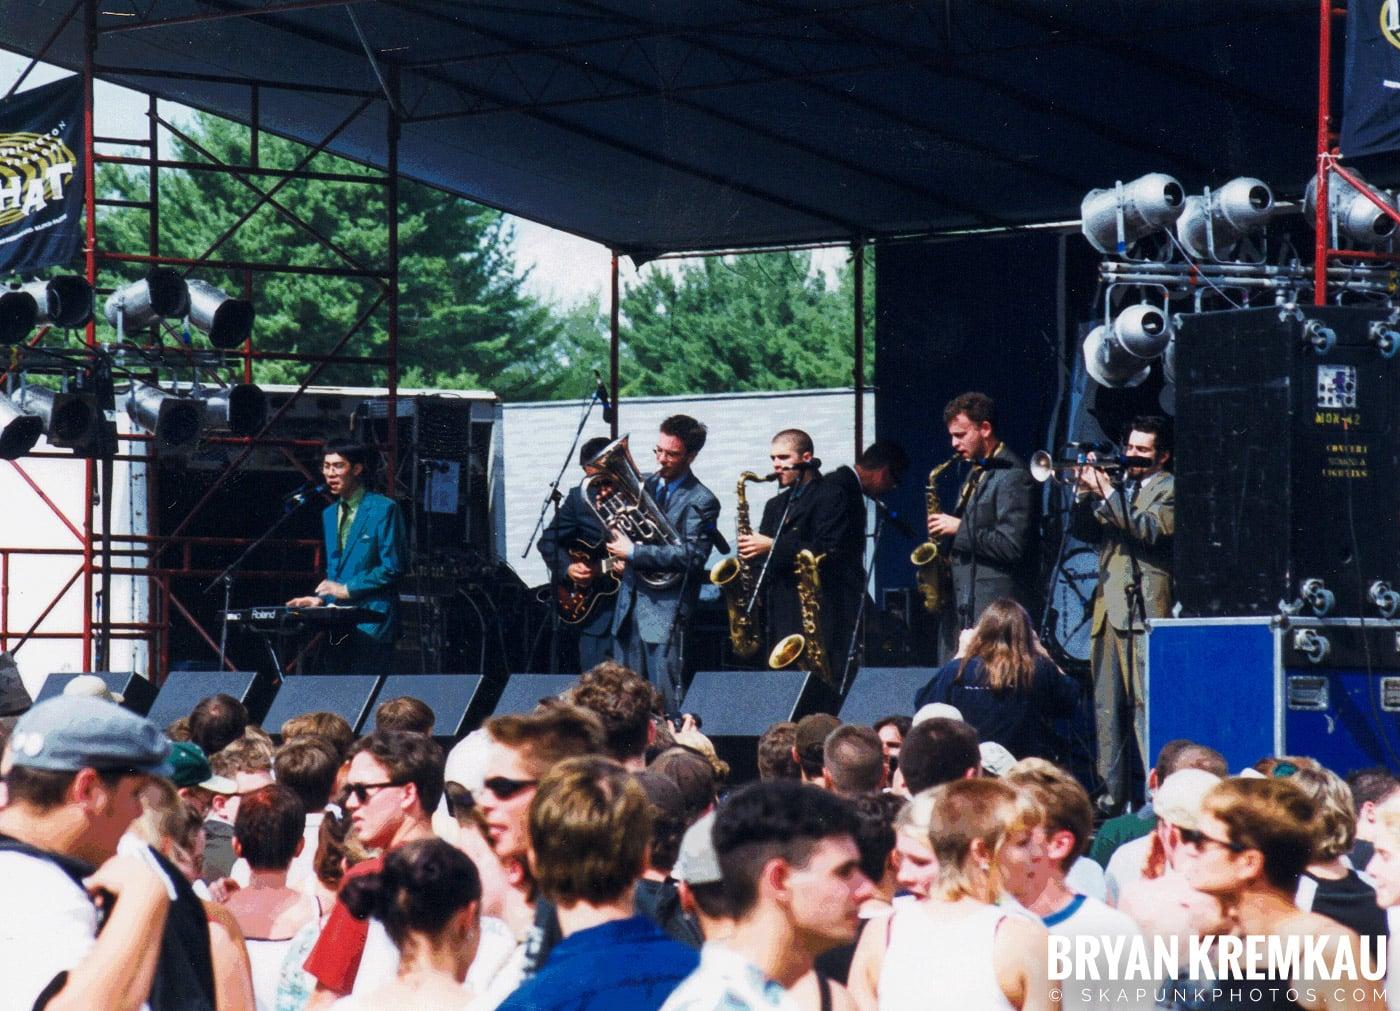 Skavoovie & The Epitones @ New England Ska Fest 98, Westford, MA - 8.22.98 (2)